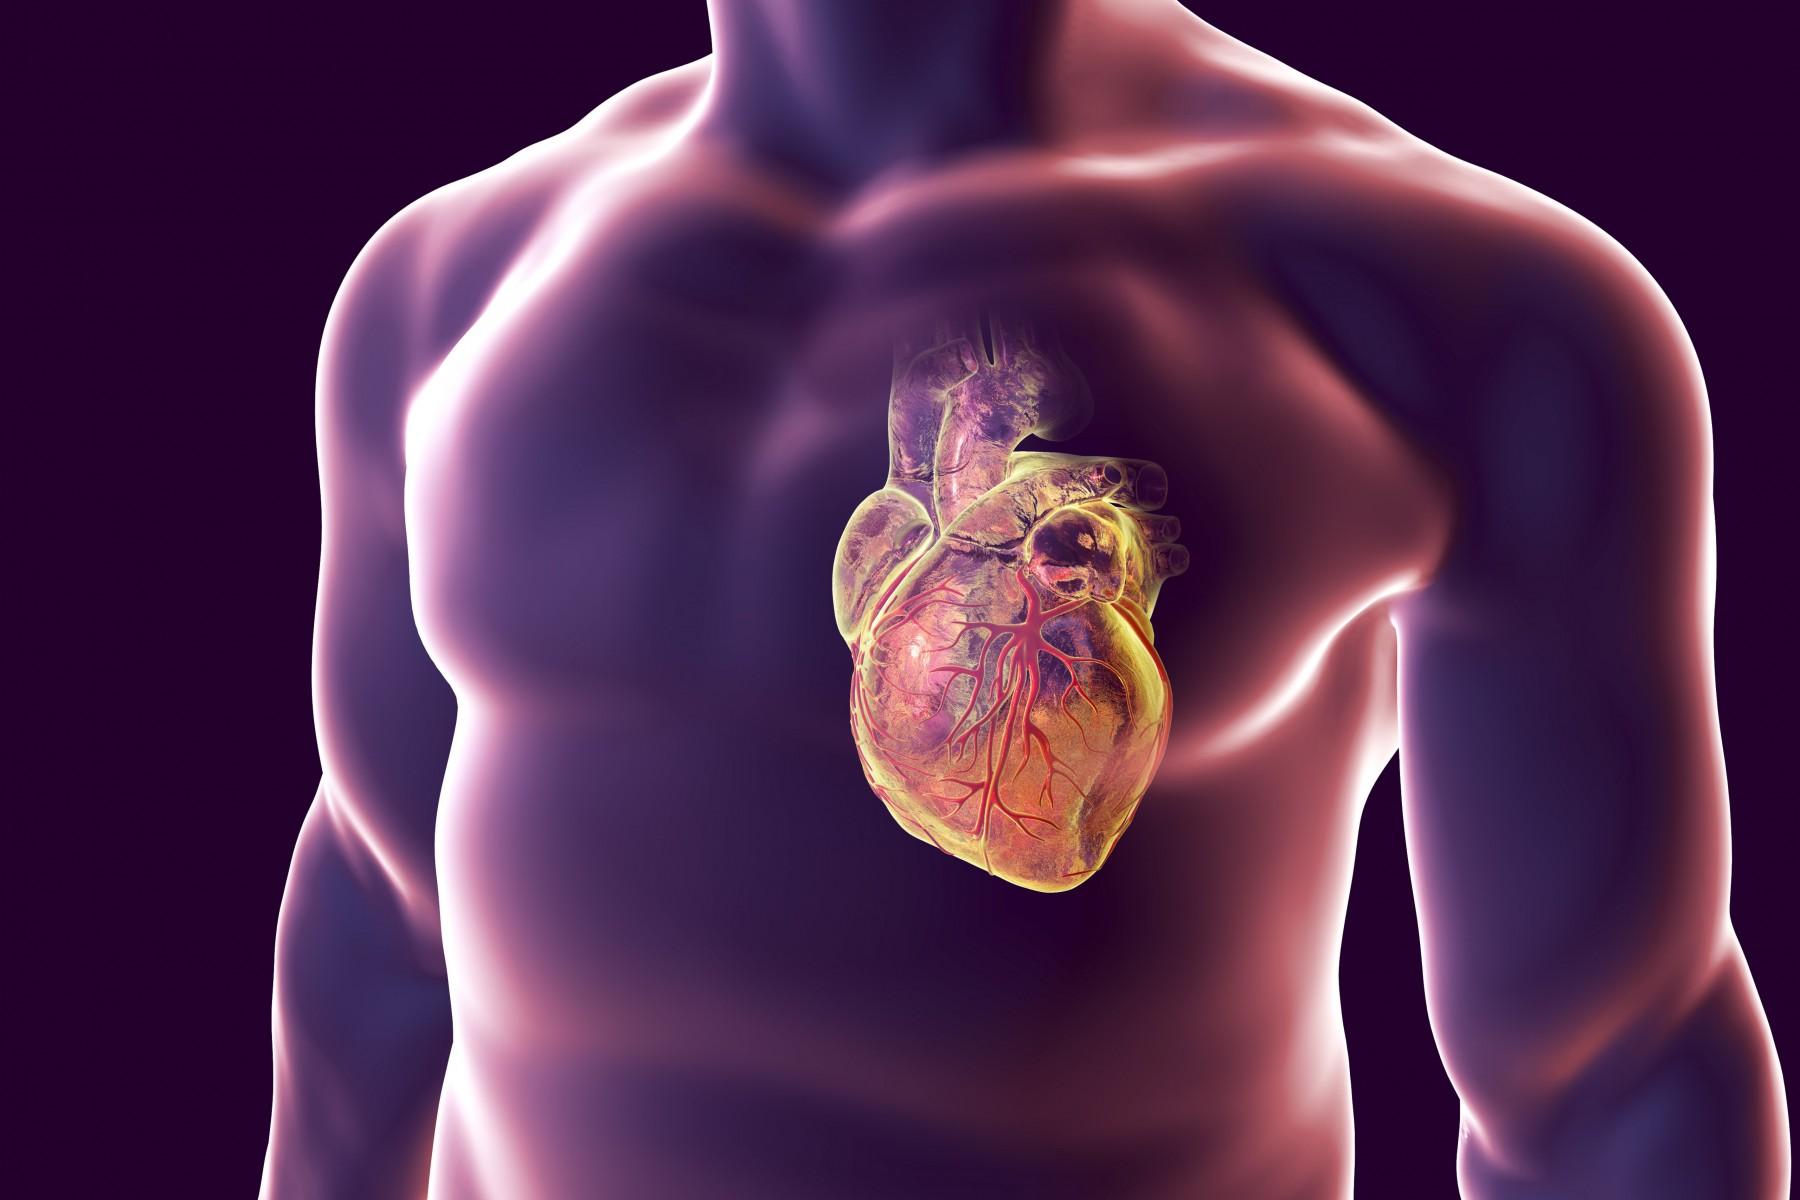 Healio Preventing Diagnosing And Treating Heart Disease In Men